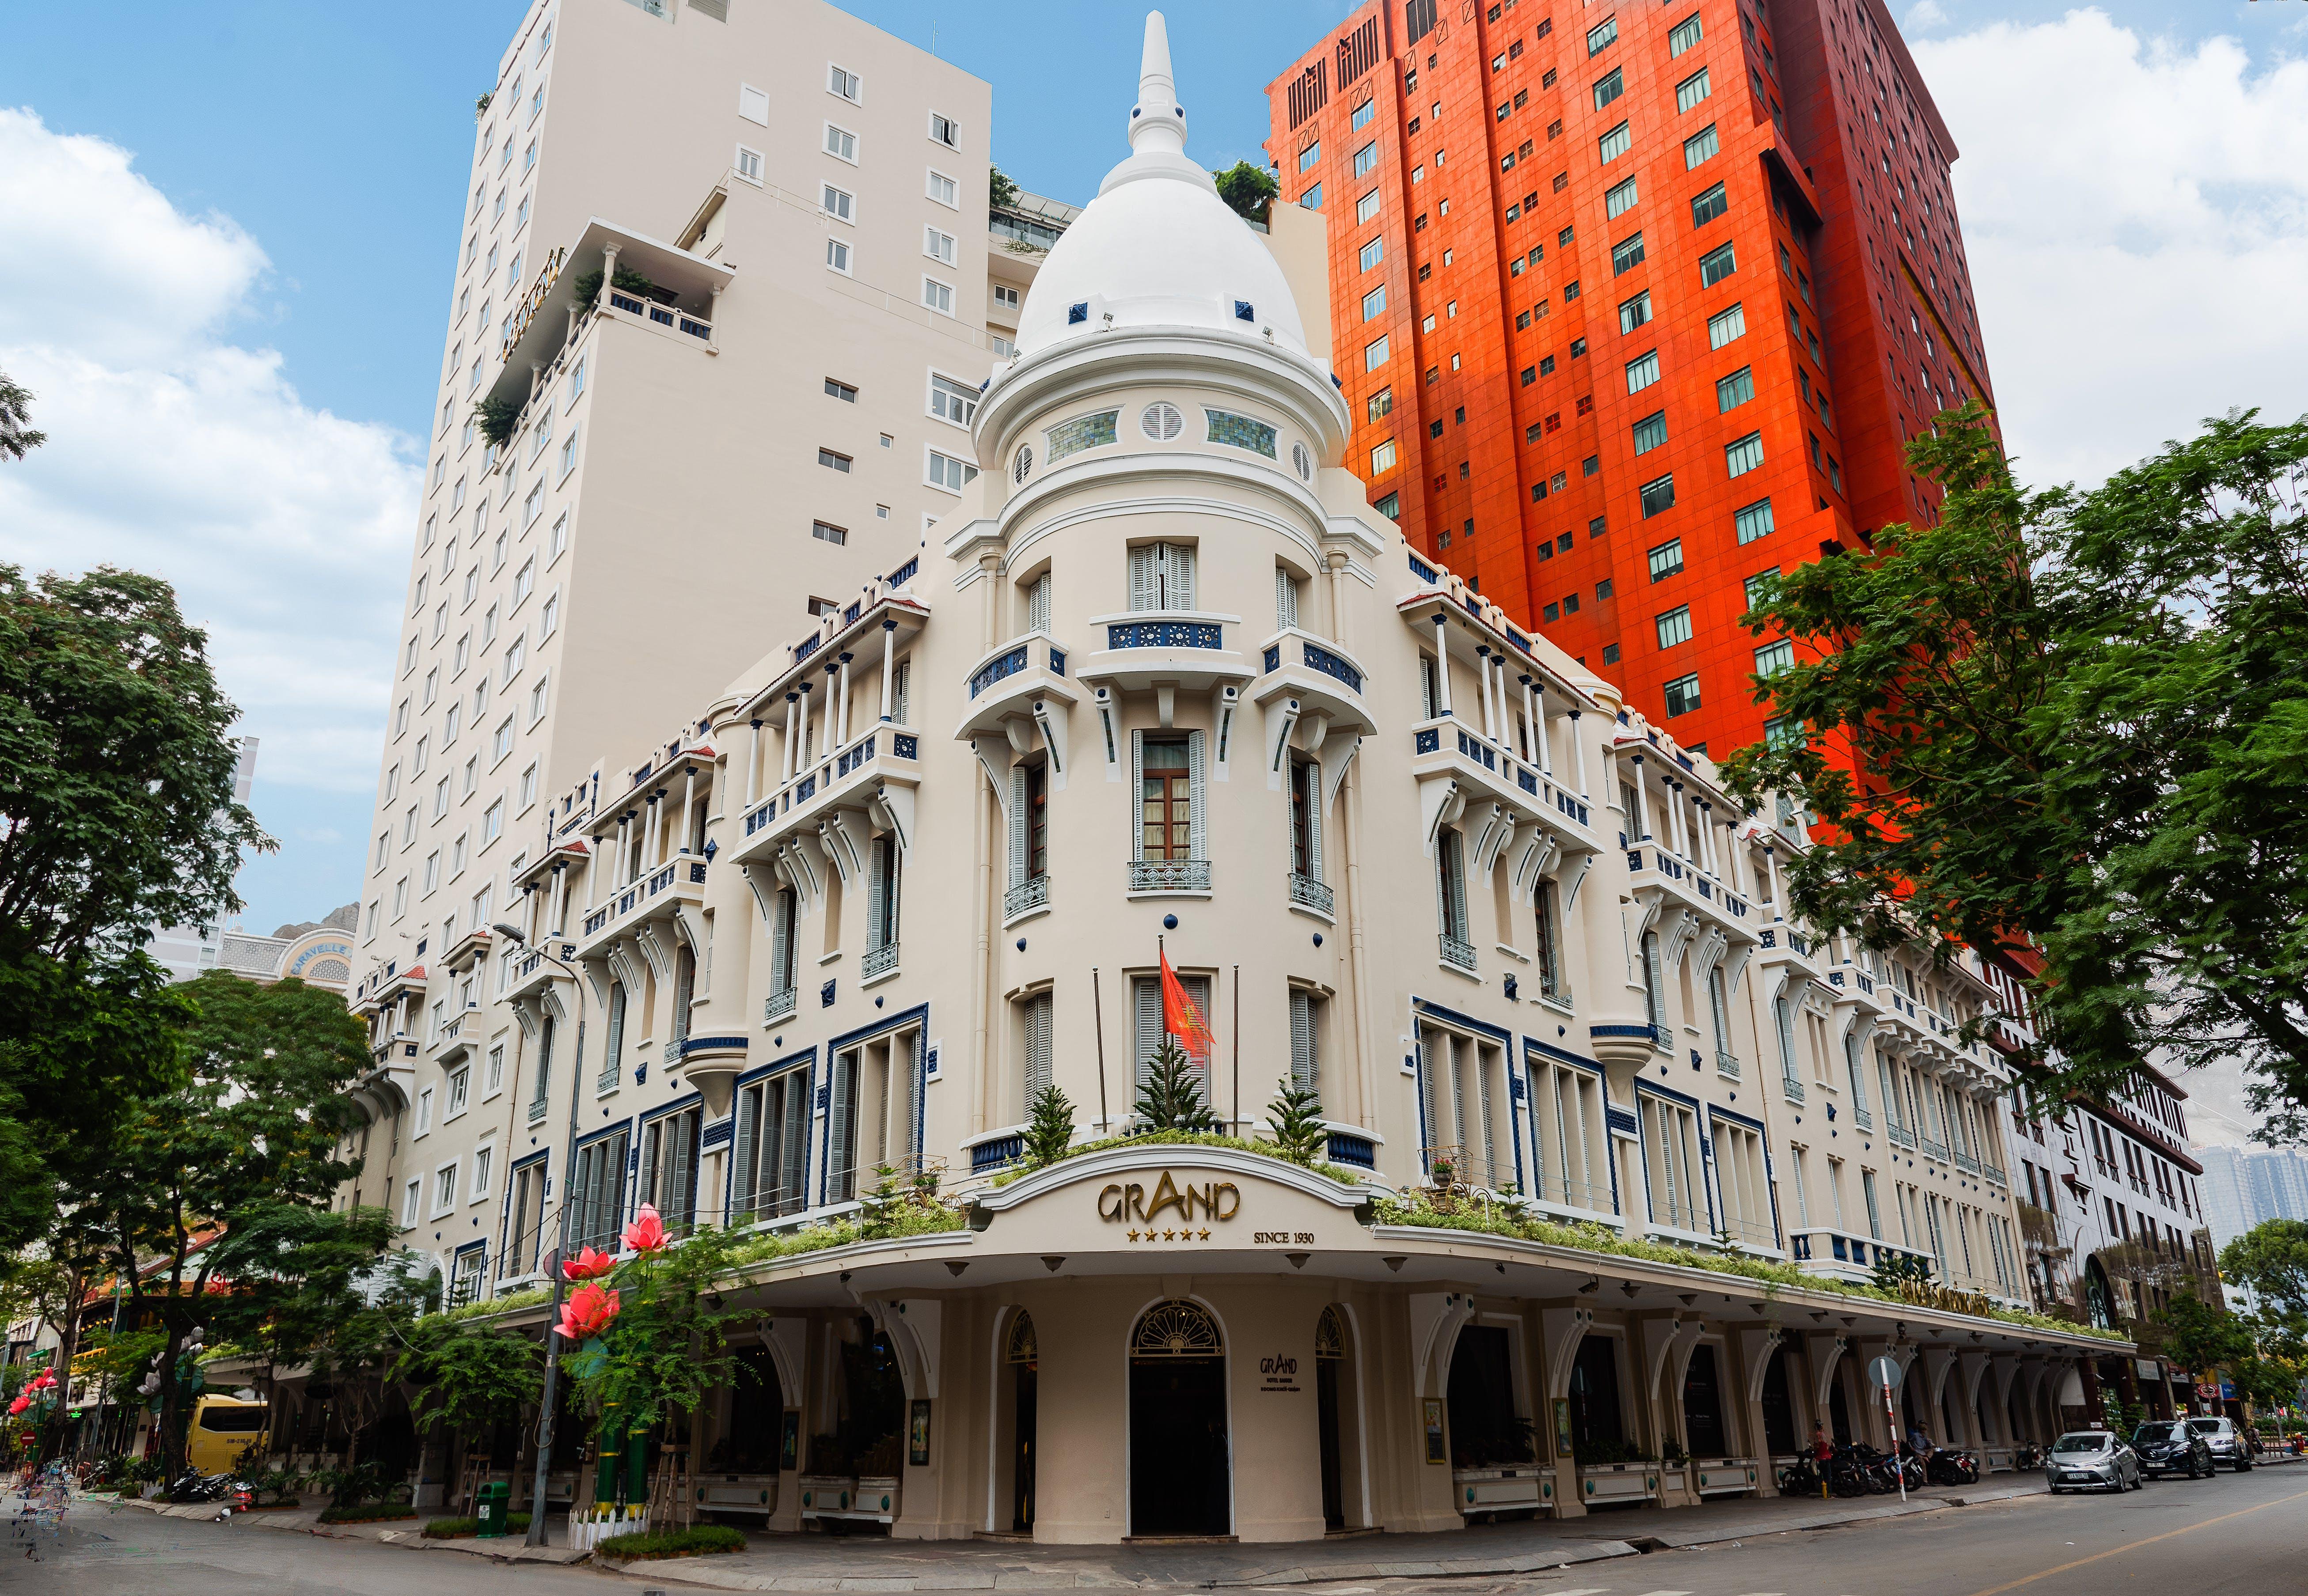 Free stock photo of grand hotel